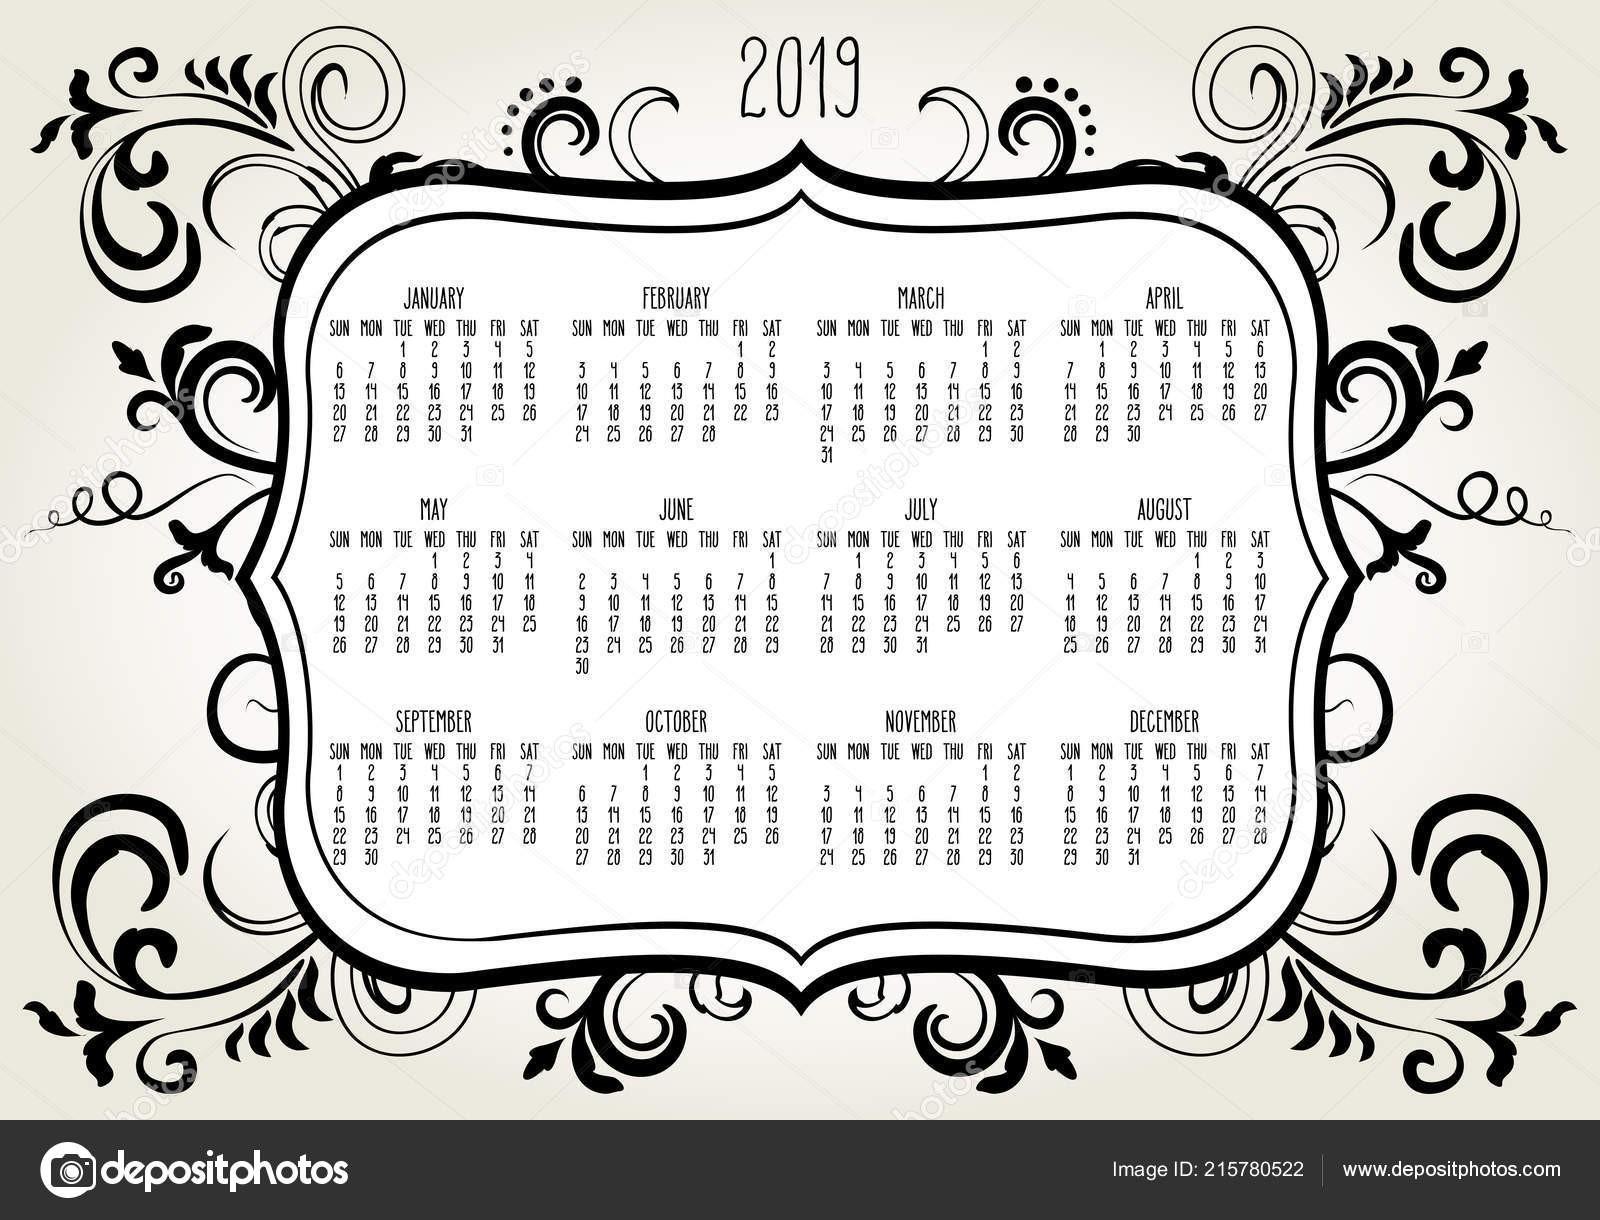 depositphotos stock illustration year 2019 plain contemporary vector